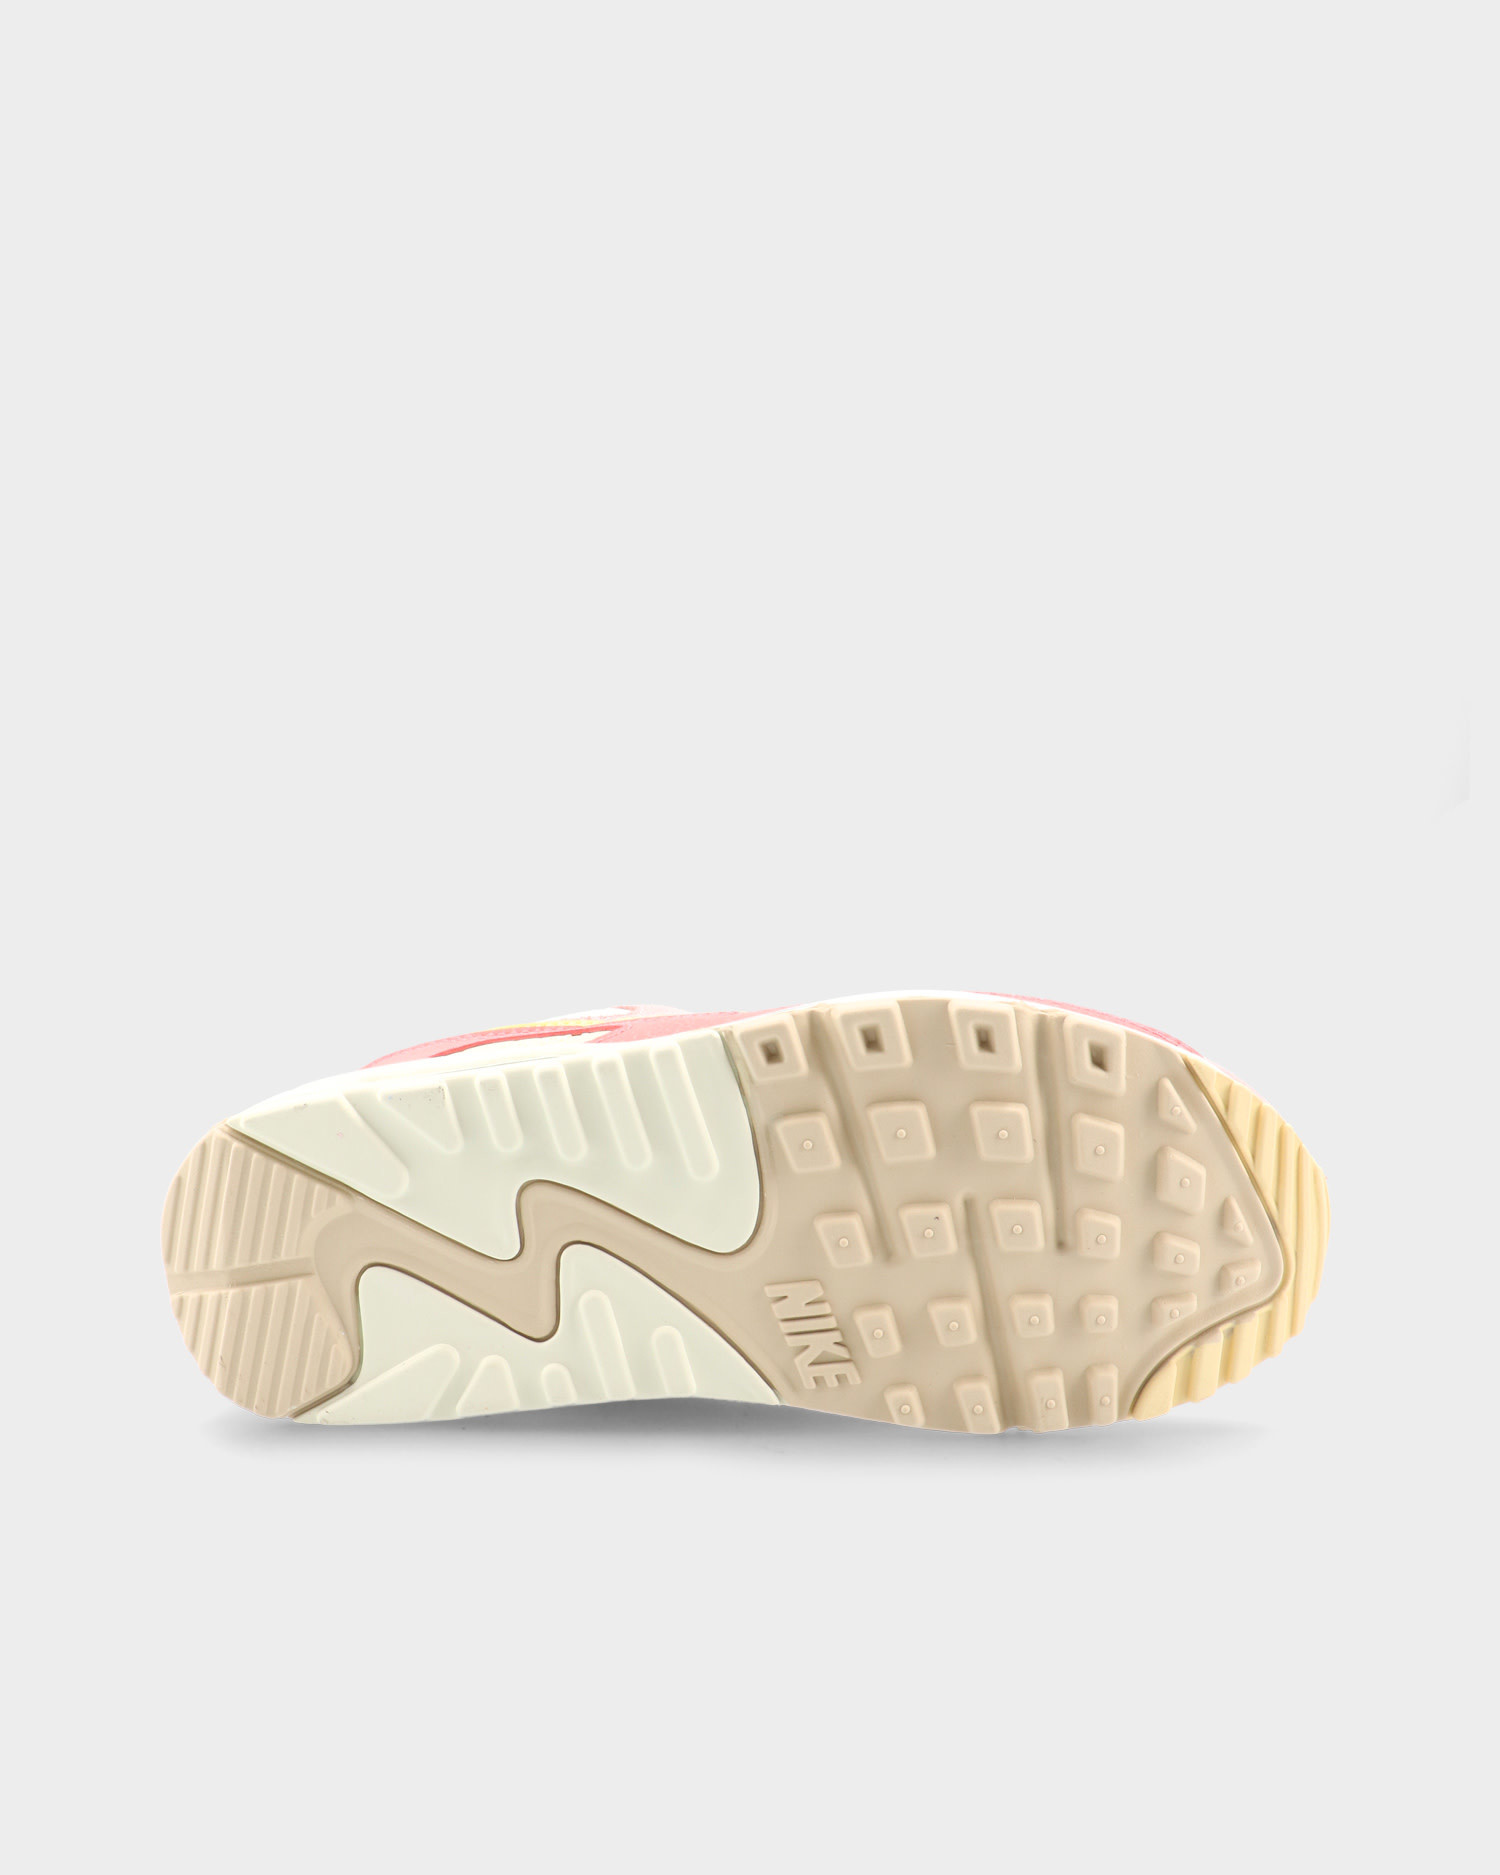 Nike Air Max 90 Sea Glass/Saturn Gold-Pink Salt-Seafoam